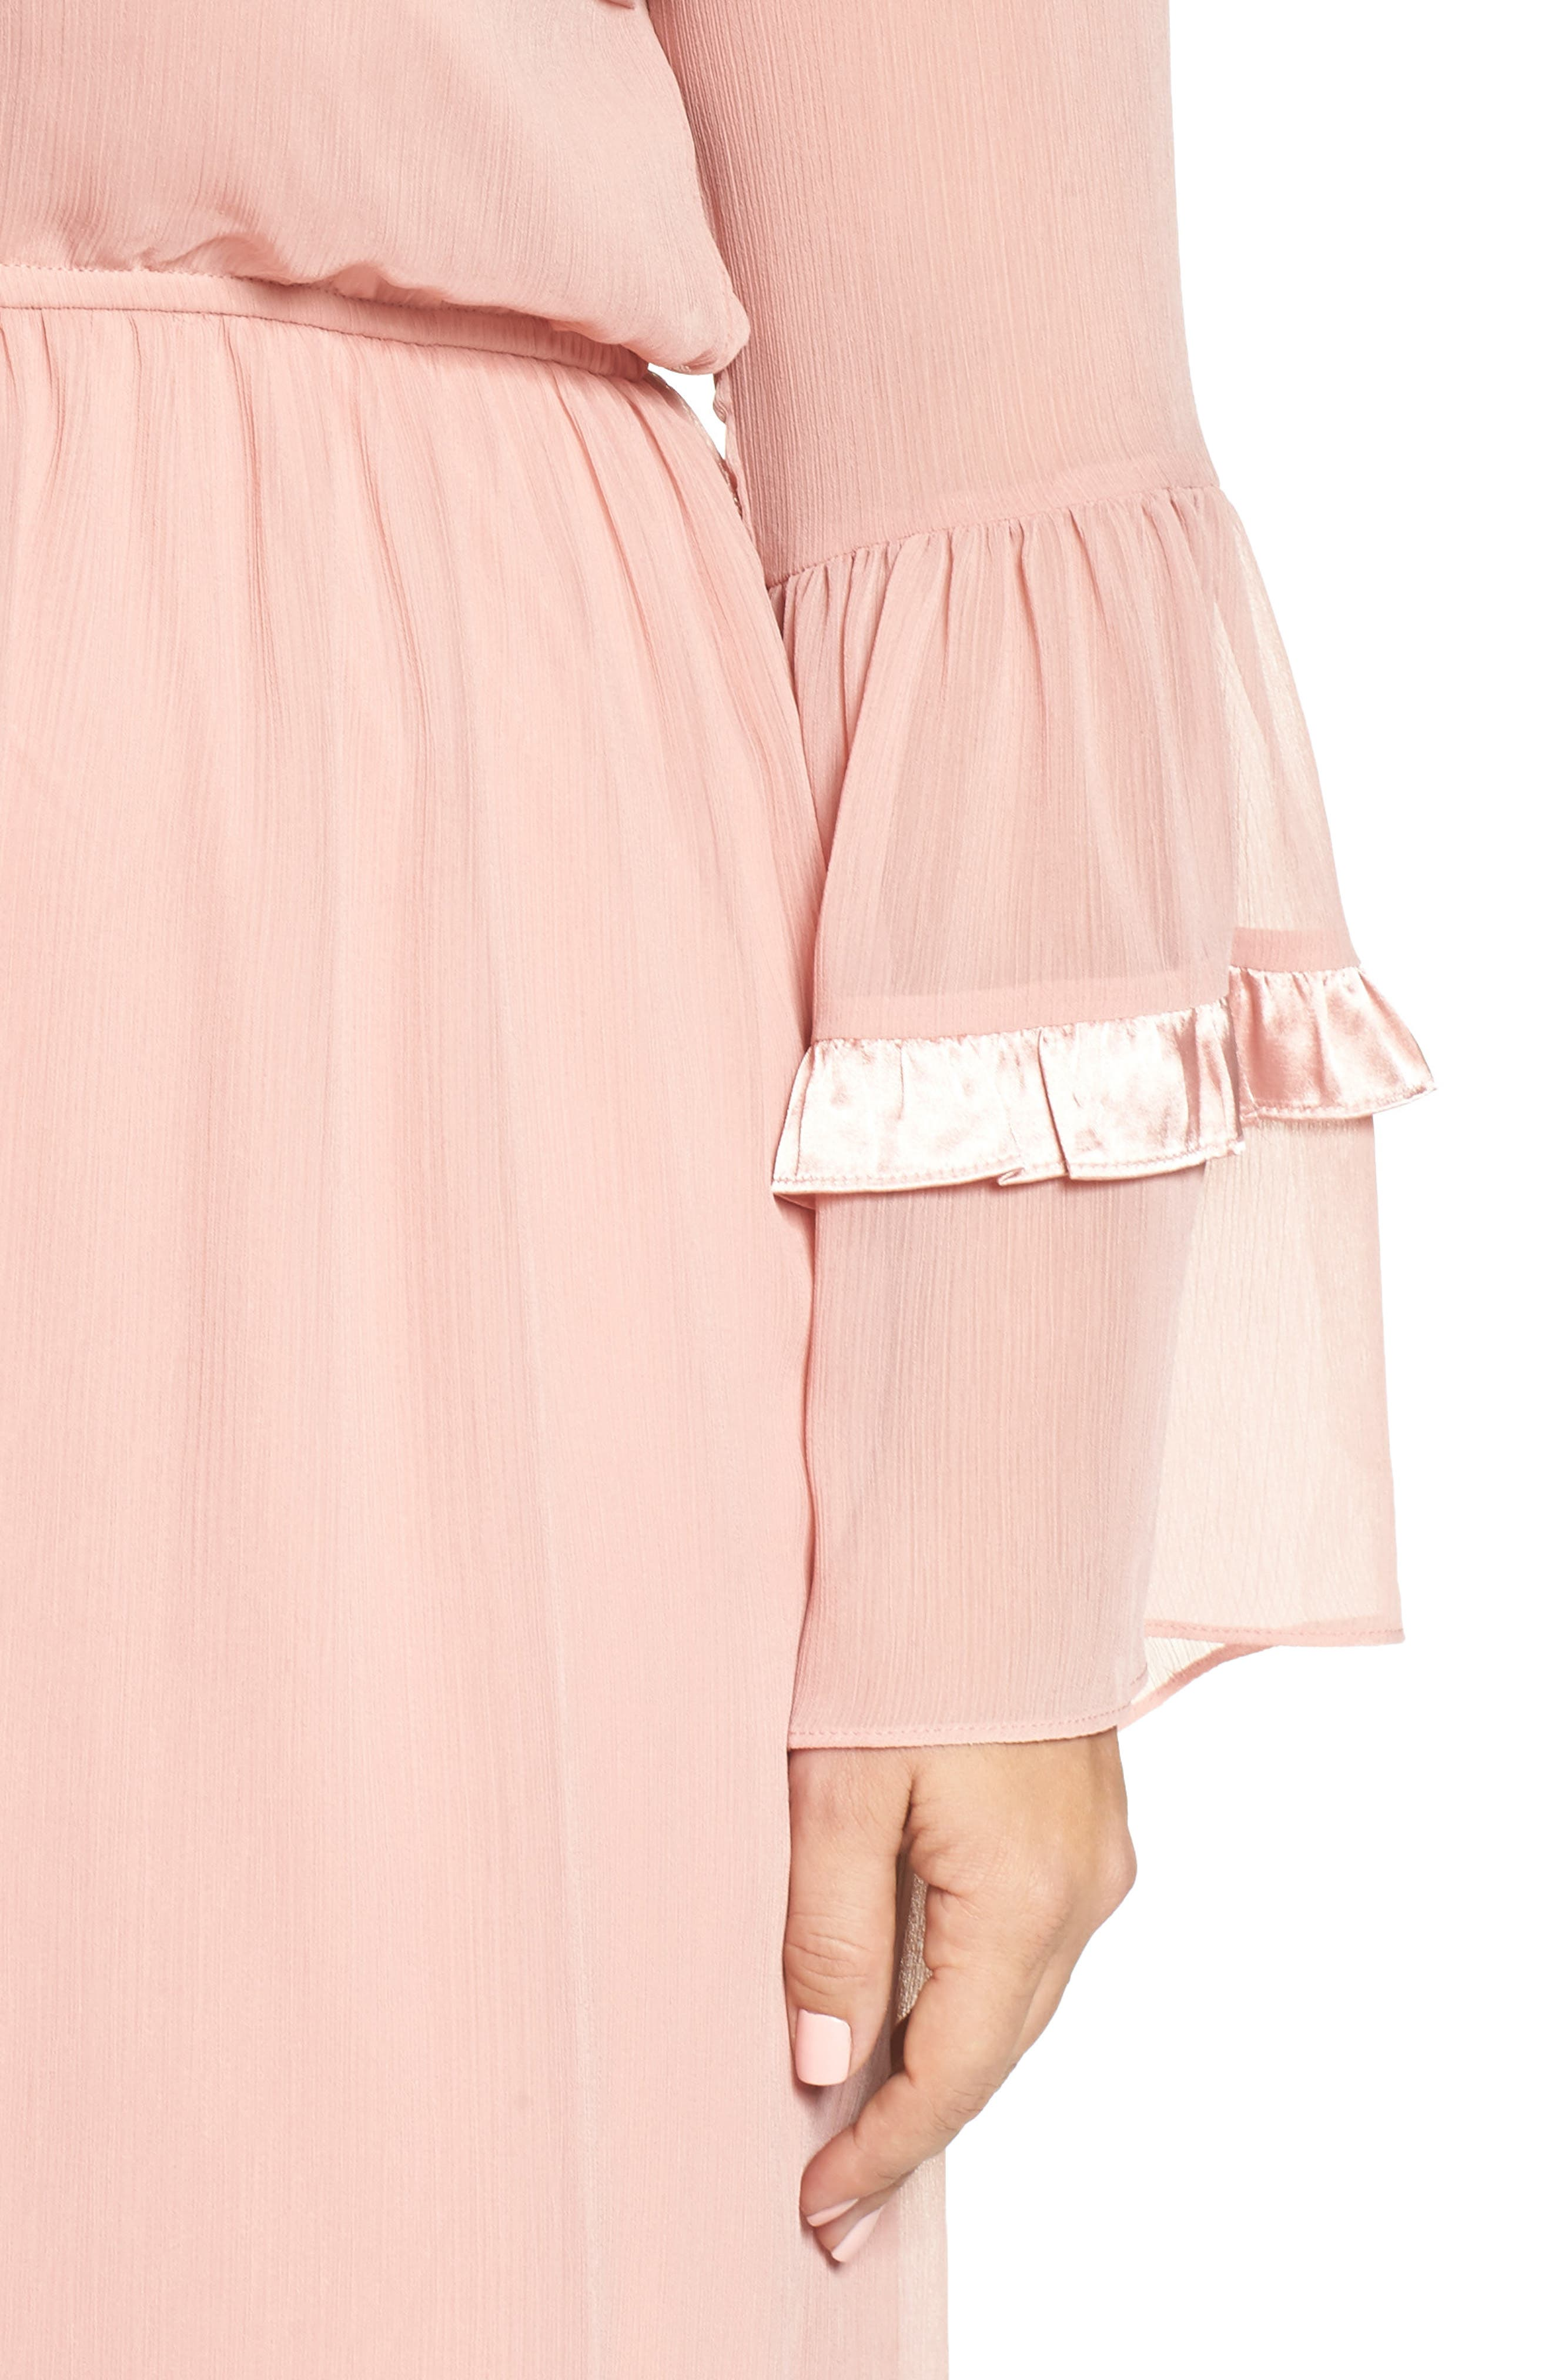 Satin Trim Crinkle Dress,                             Alternate thumbnail 4, color,                             650